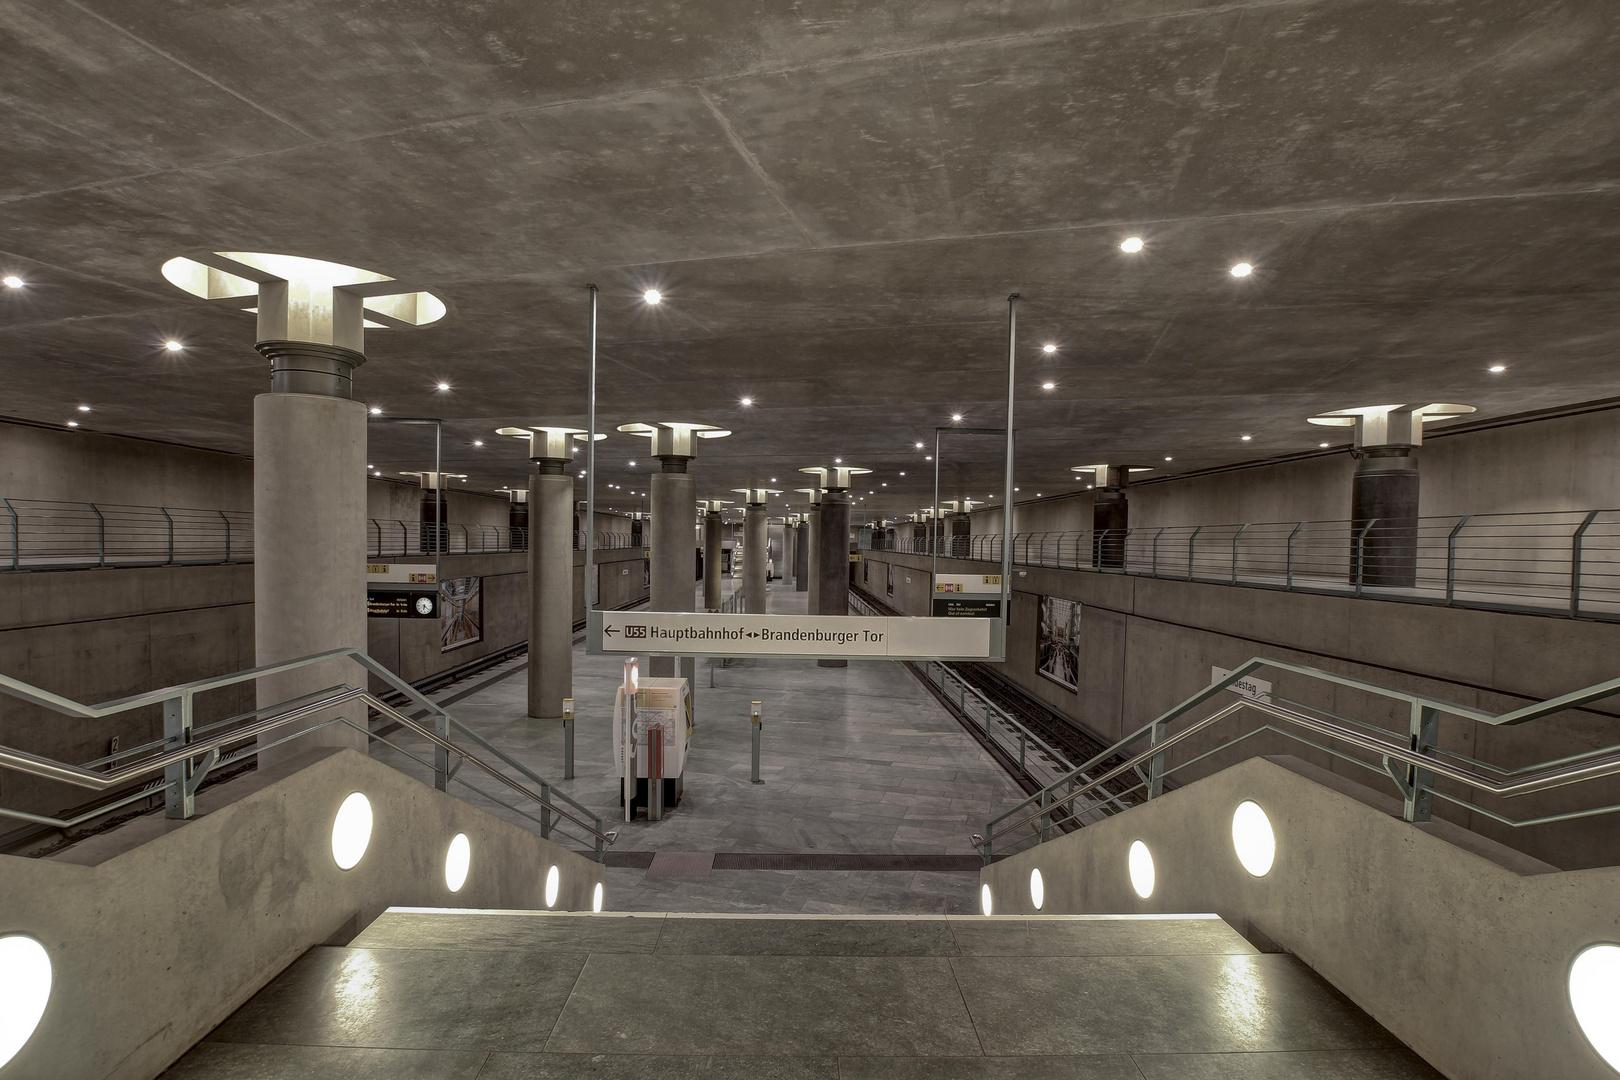 B - U-Bahnhof Bundestag